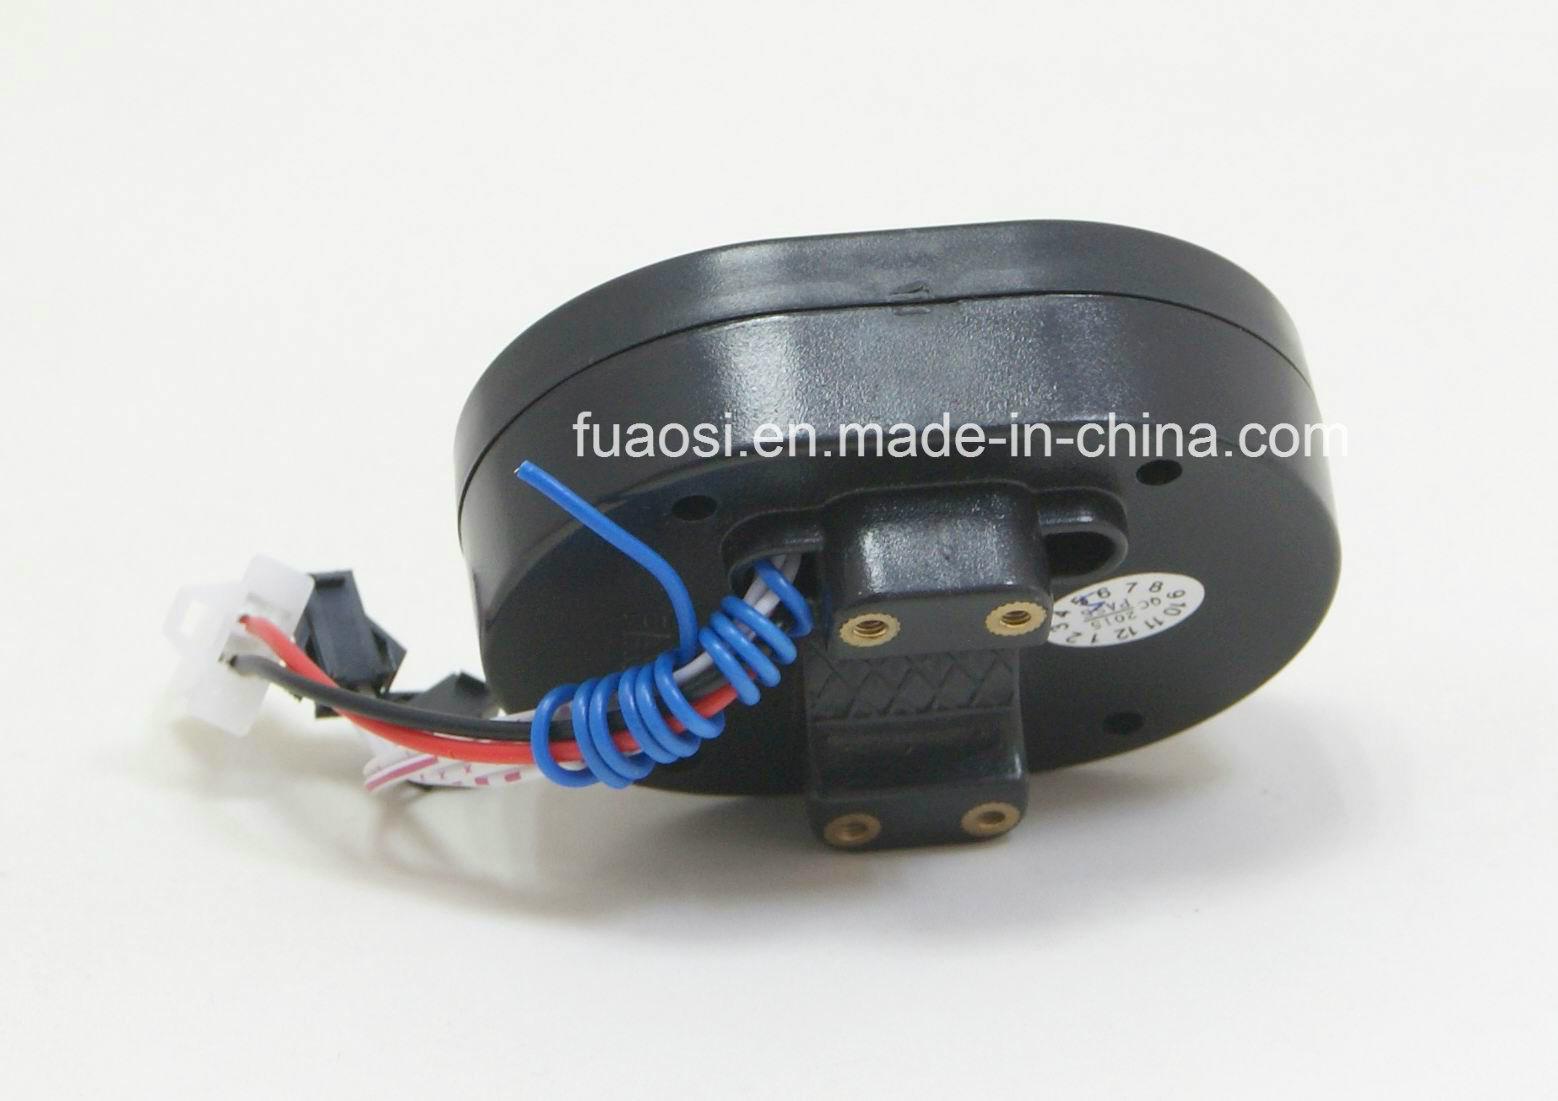 FM/MP3/USB/TF Card Player (FAS-MP3-728)